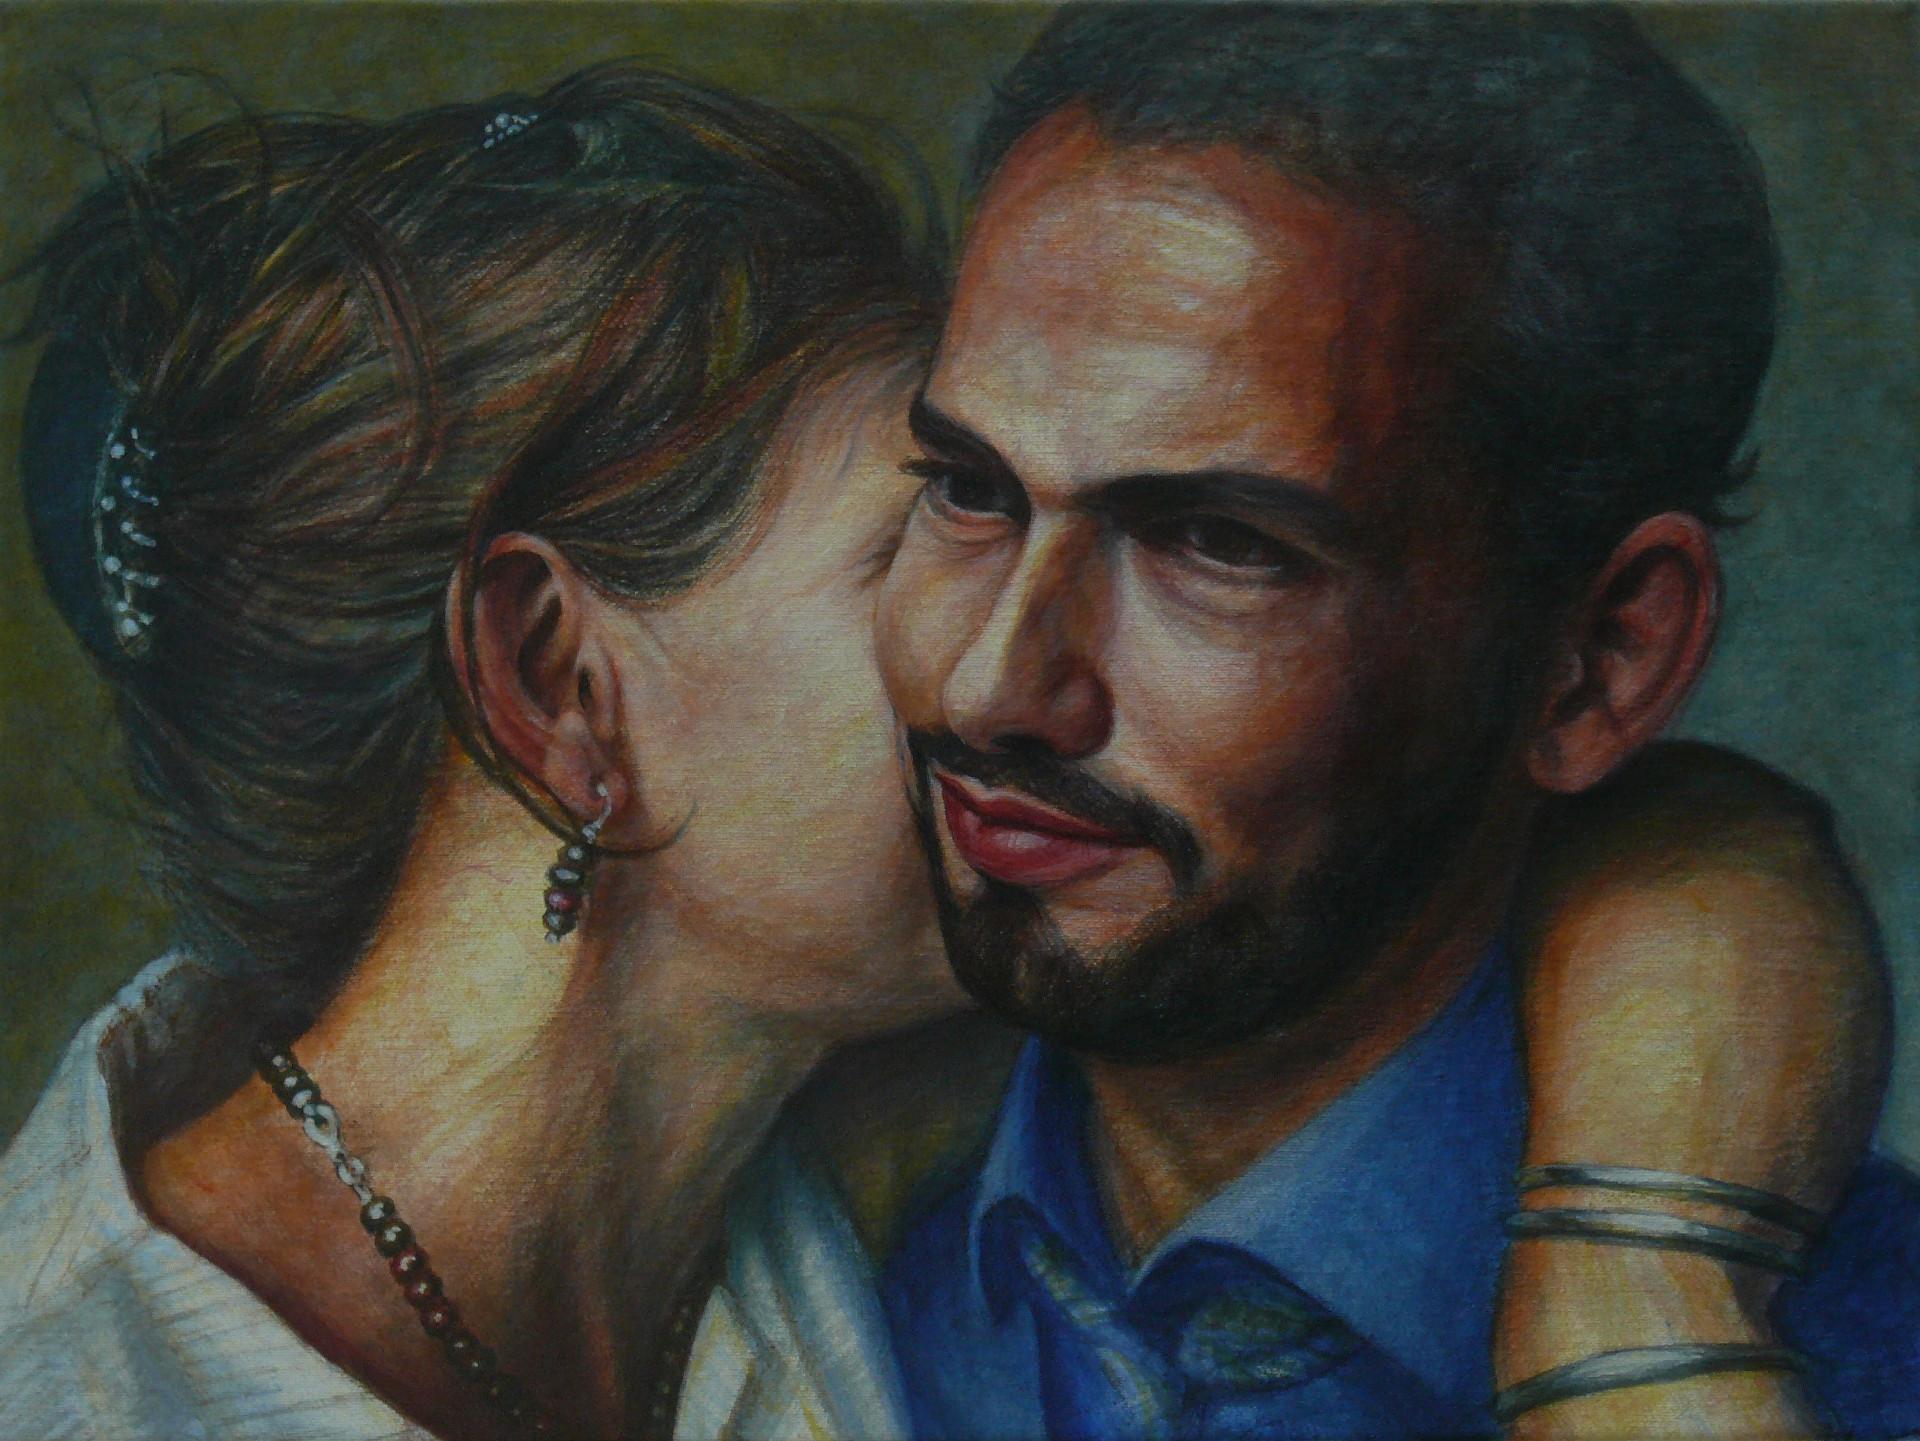 Philipp und julia (rechts) 2020 Acryl Leinwand 48x36 cm